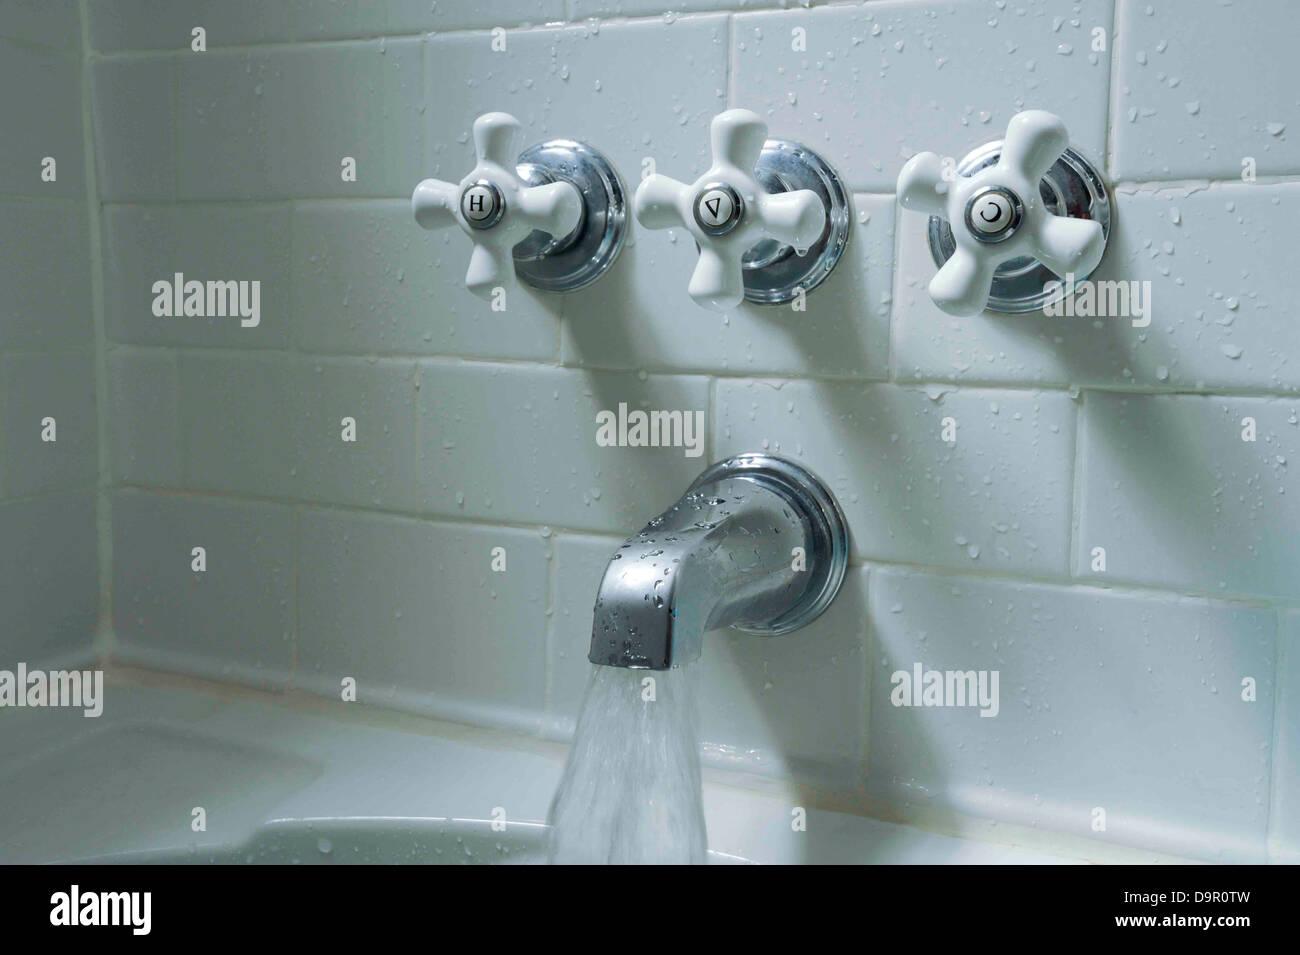 Bathtub fixtures and white subway tile - Stock Image